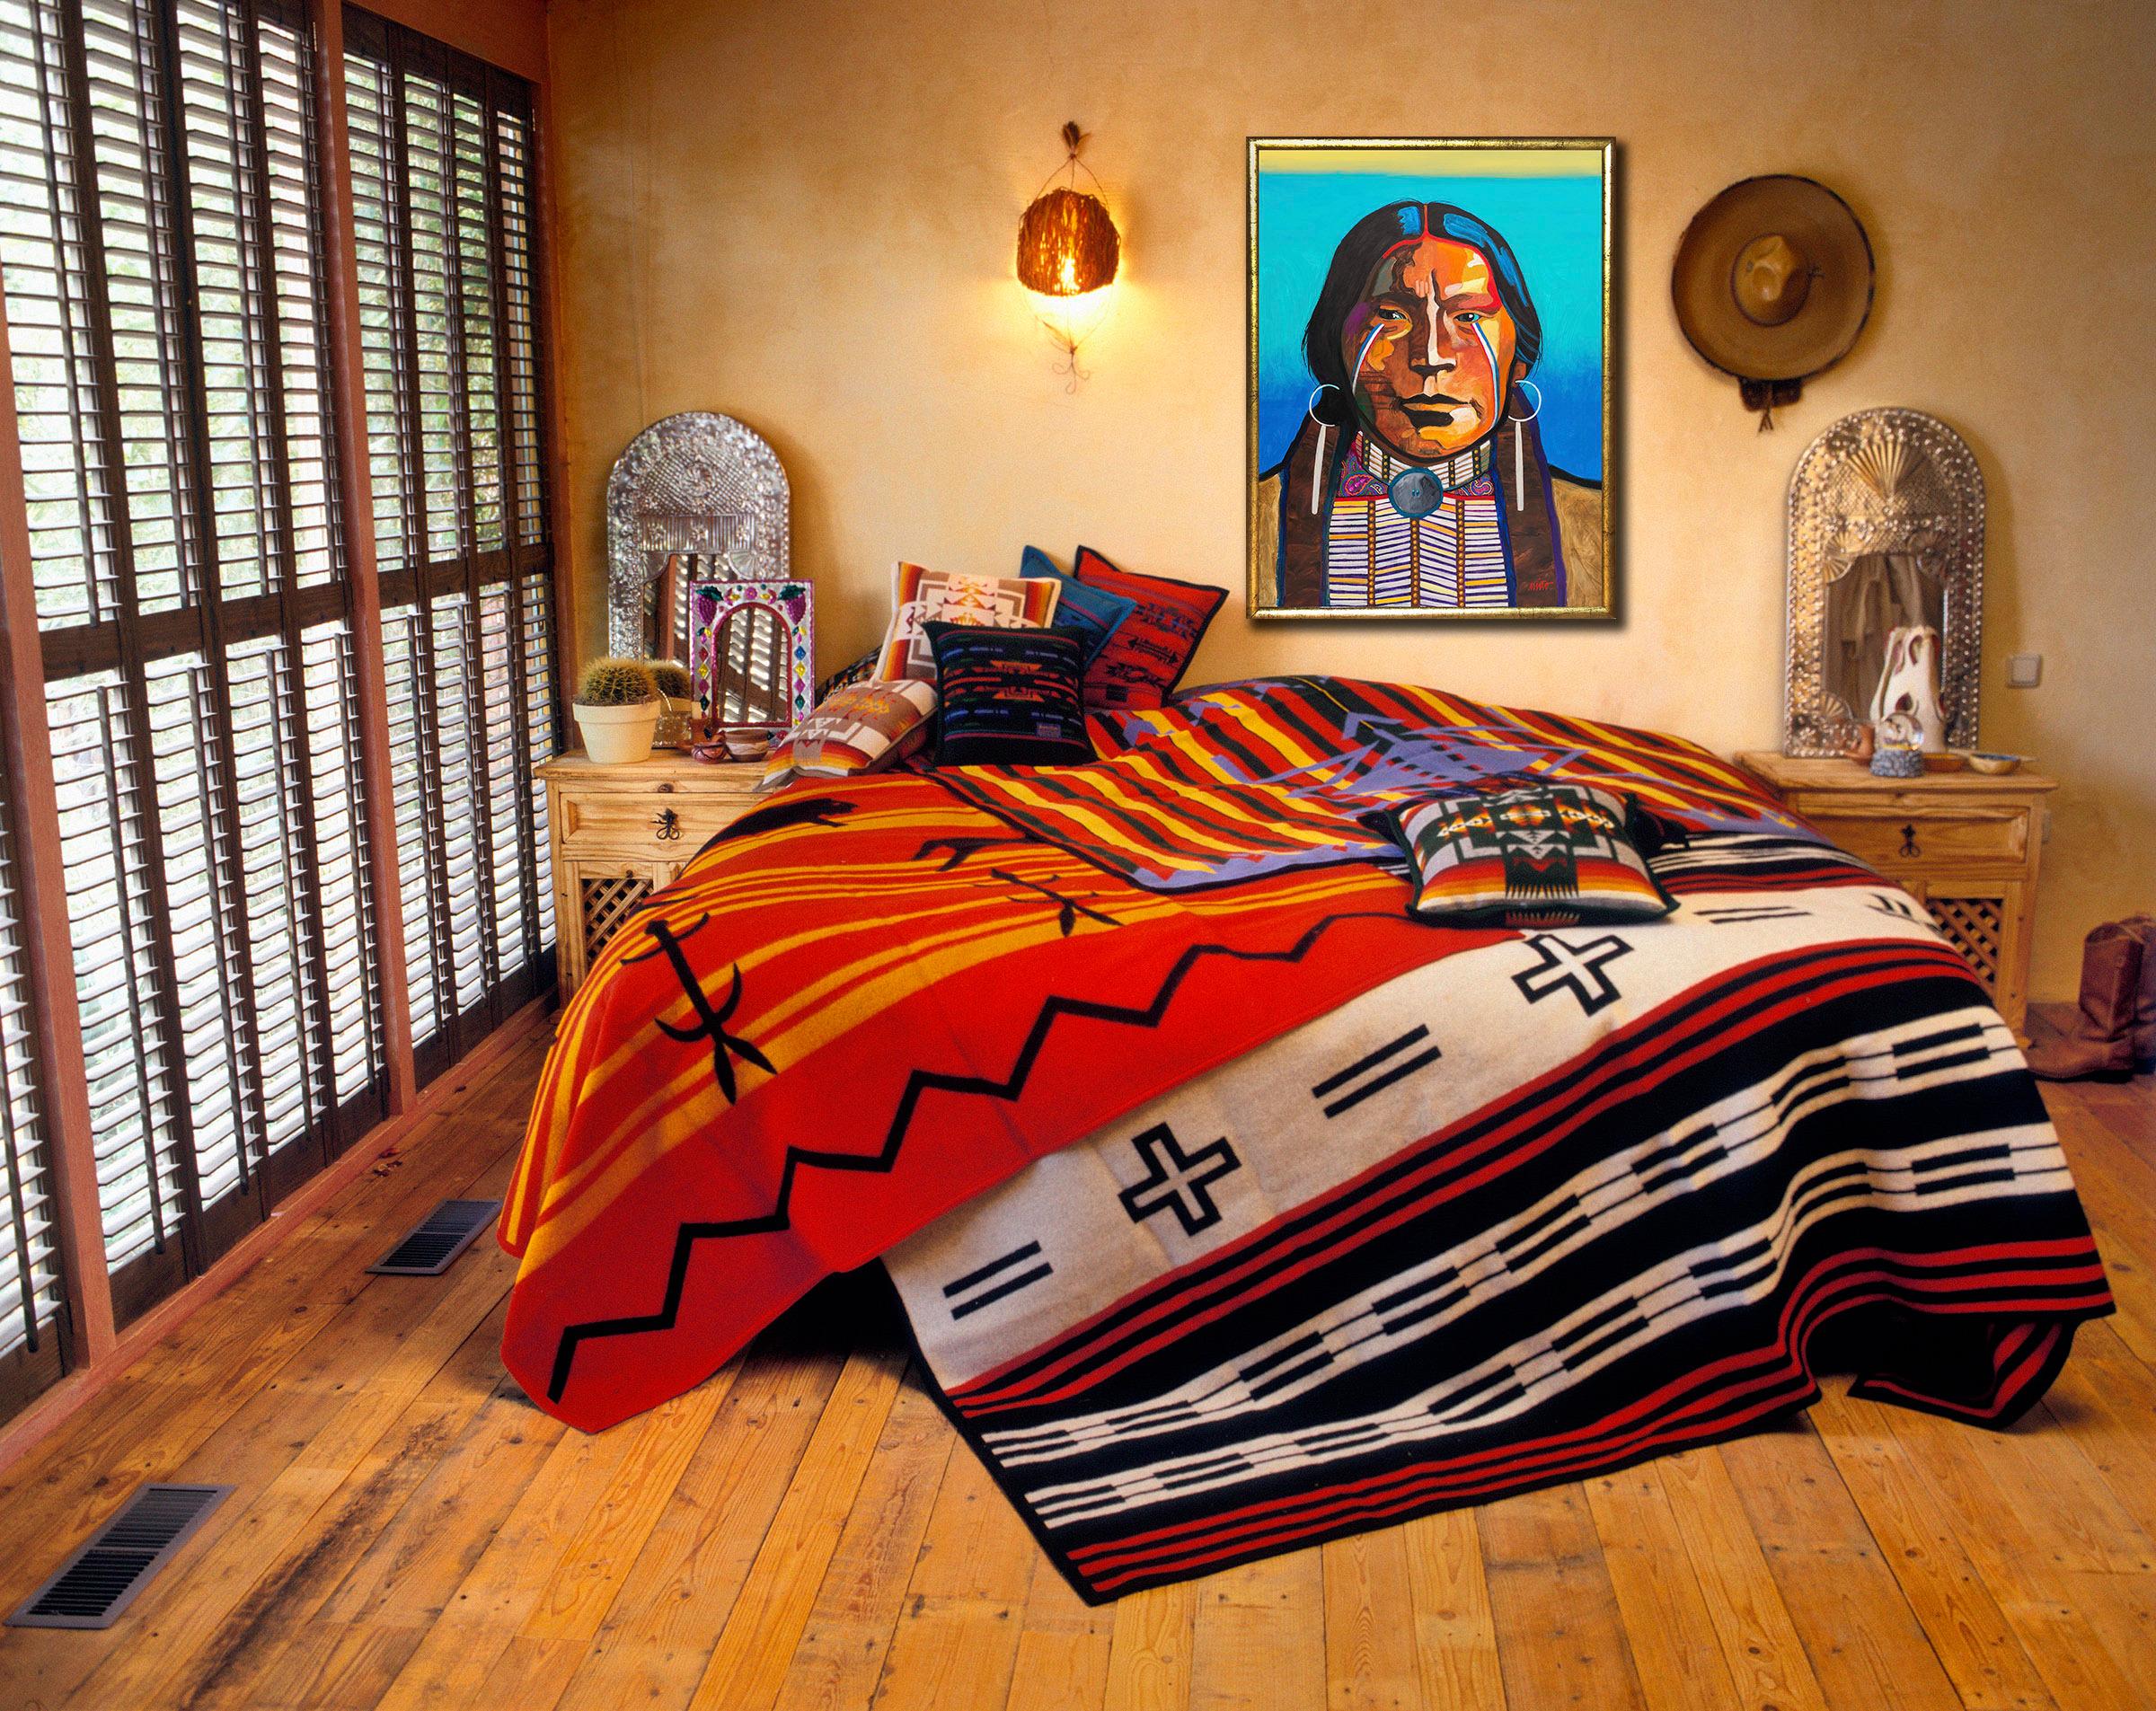 <div class='title'>           Jicarilla Apache, southwest design, santa fe interior,          </div>                 <div class='description'>           Southwest Interior design          </div>